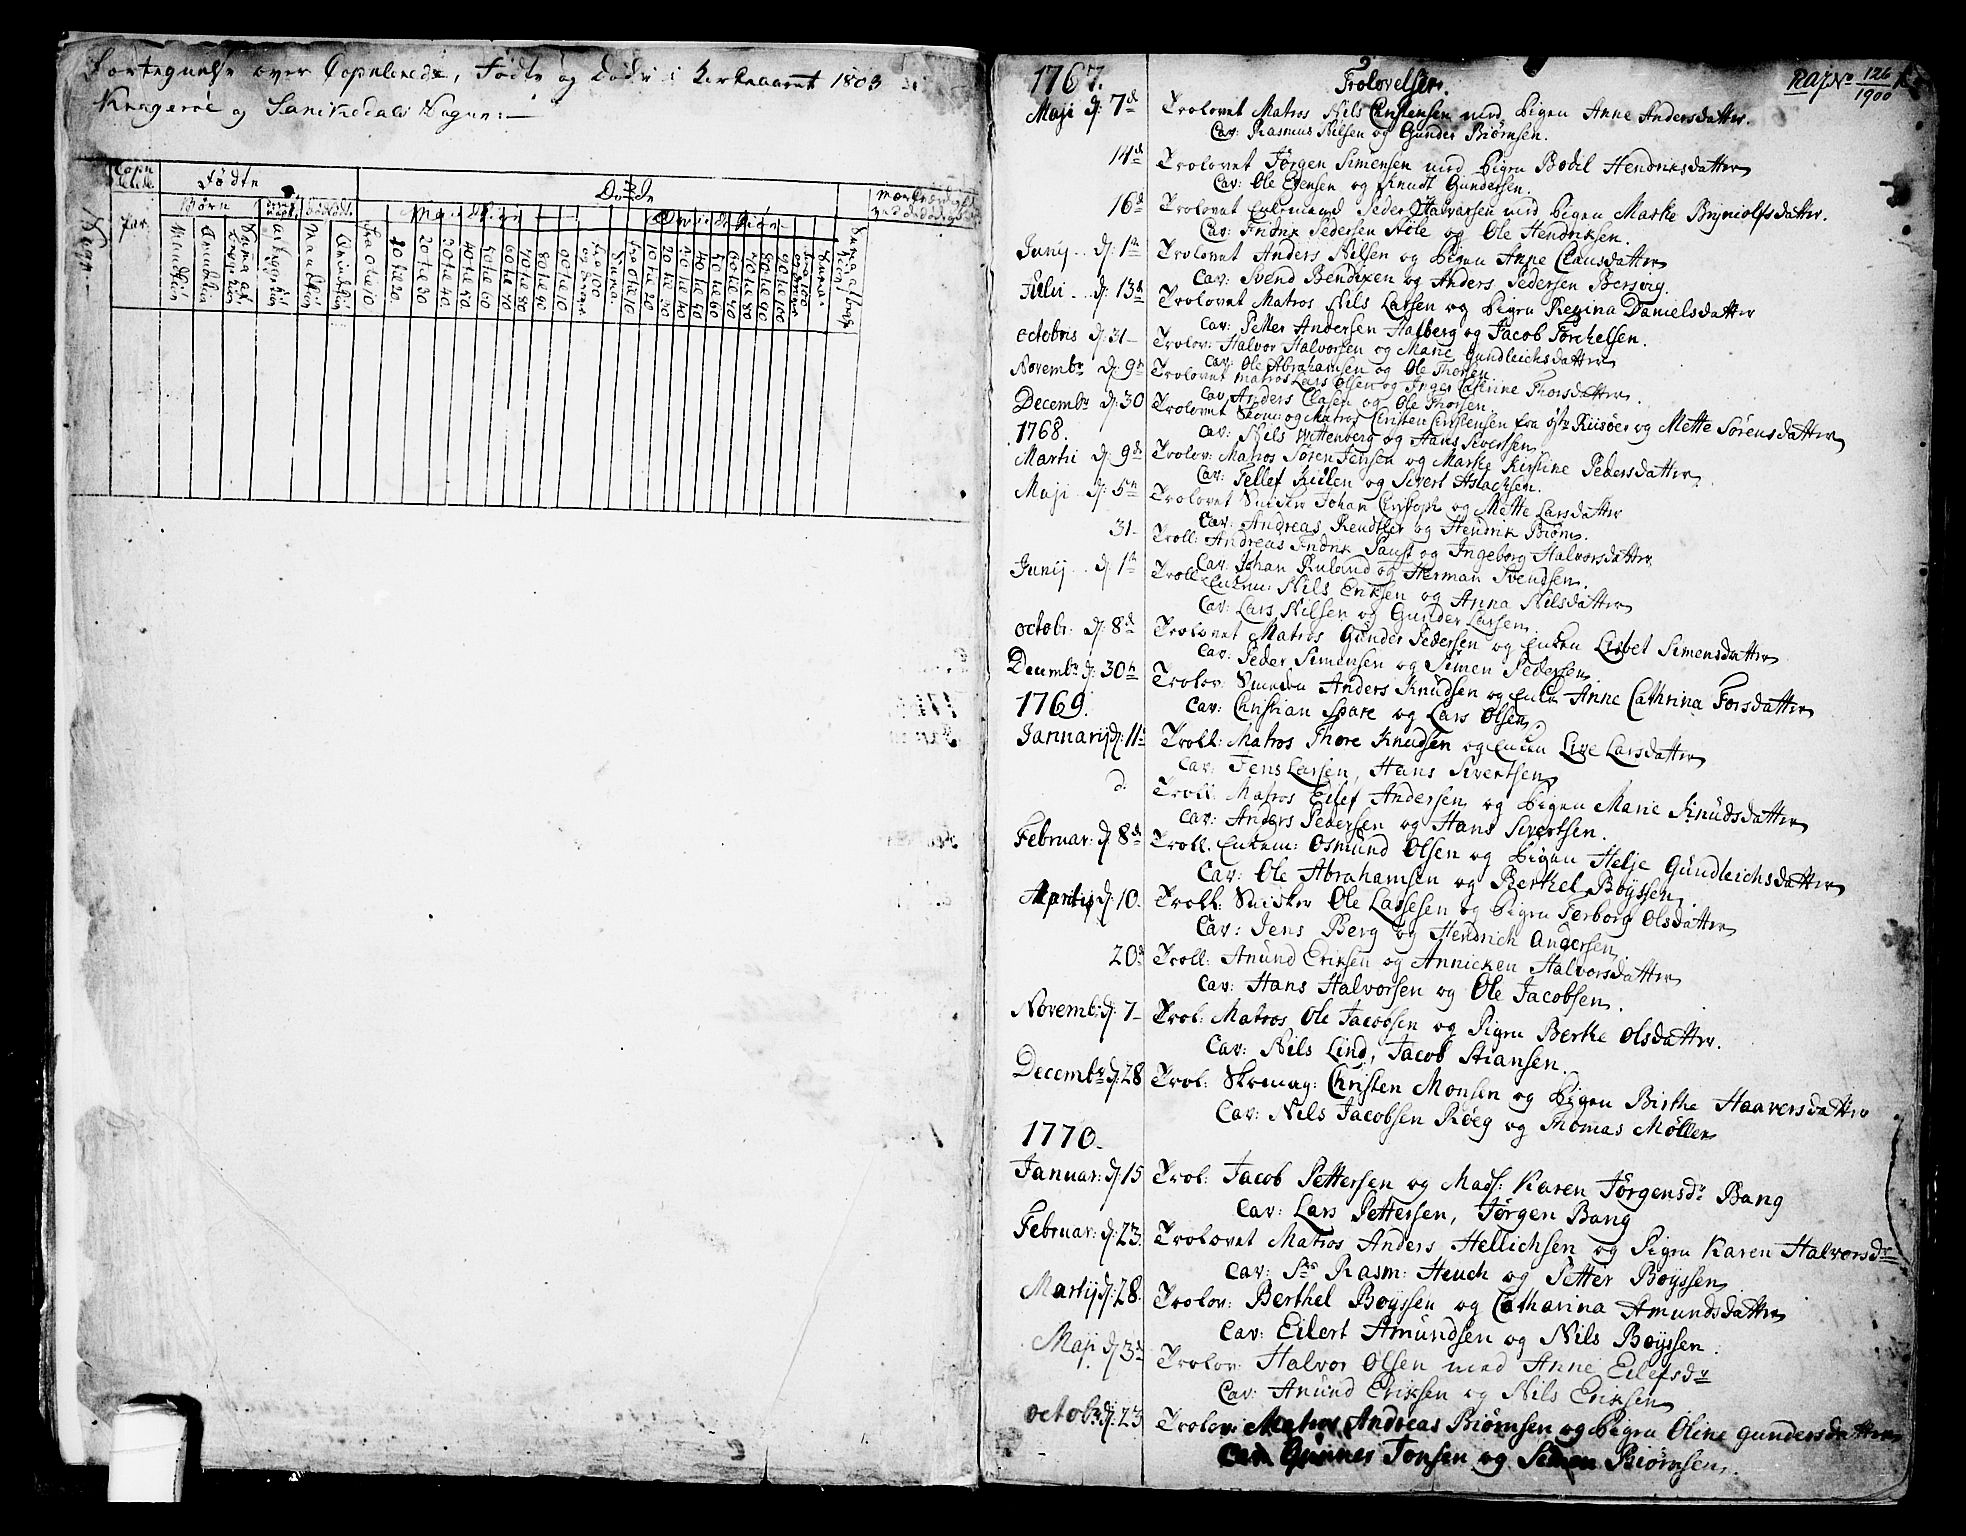 SAKO, Kragerø kirkebøker, F/Fa/L0002: Ministerialbok nr. 2, 1767-1802, s. 1